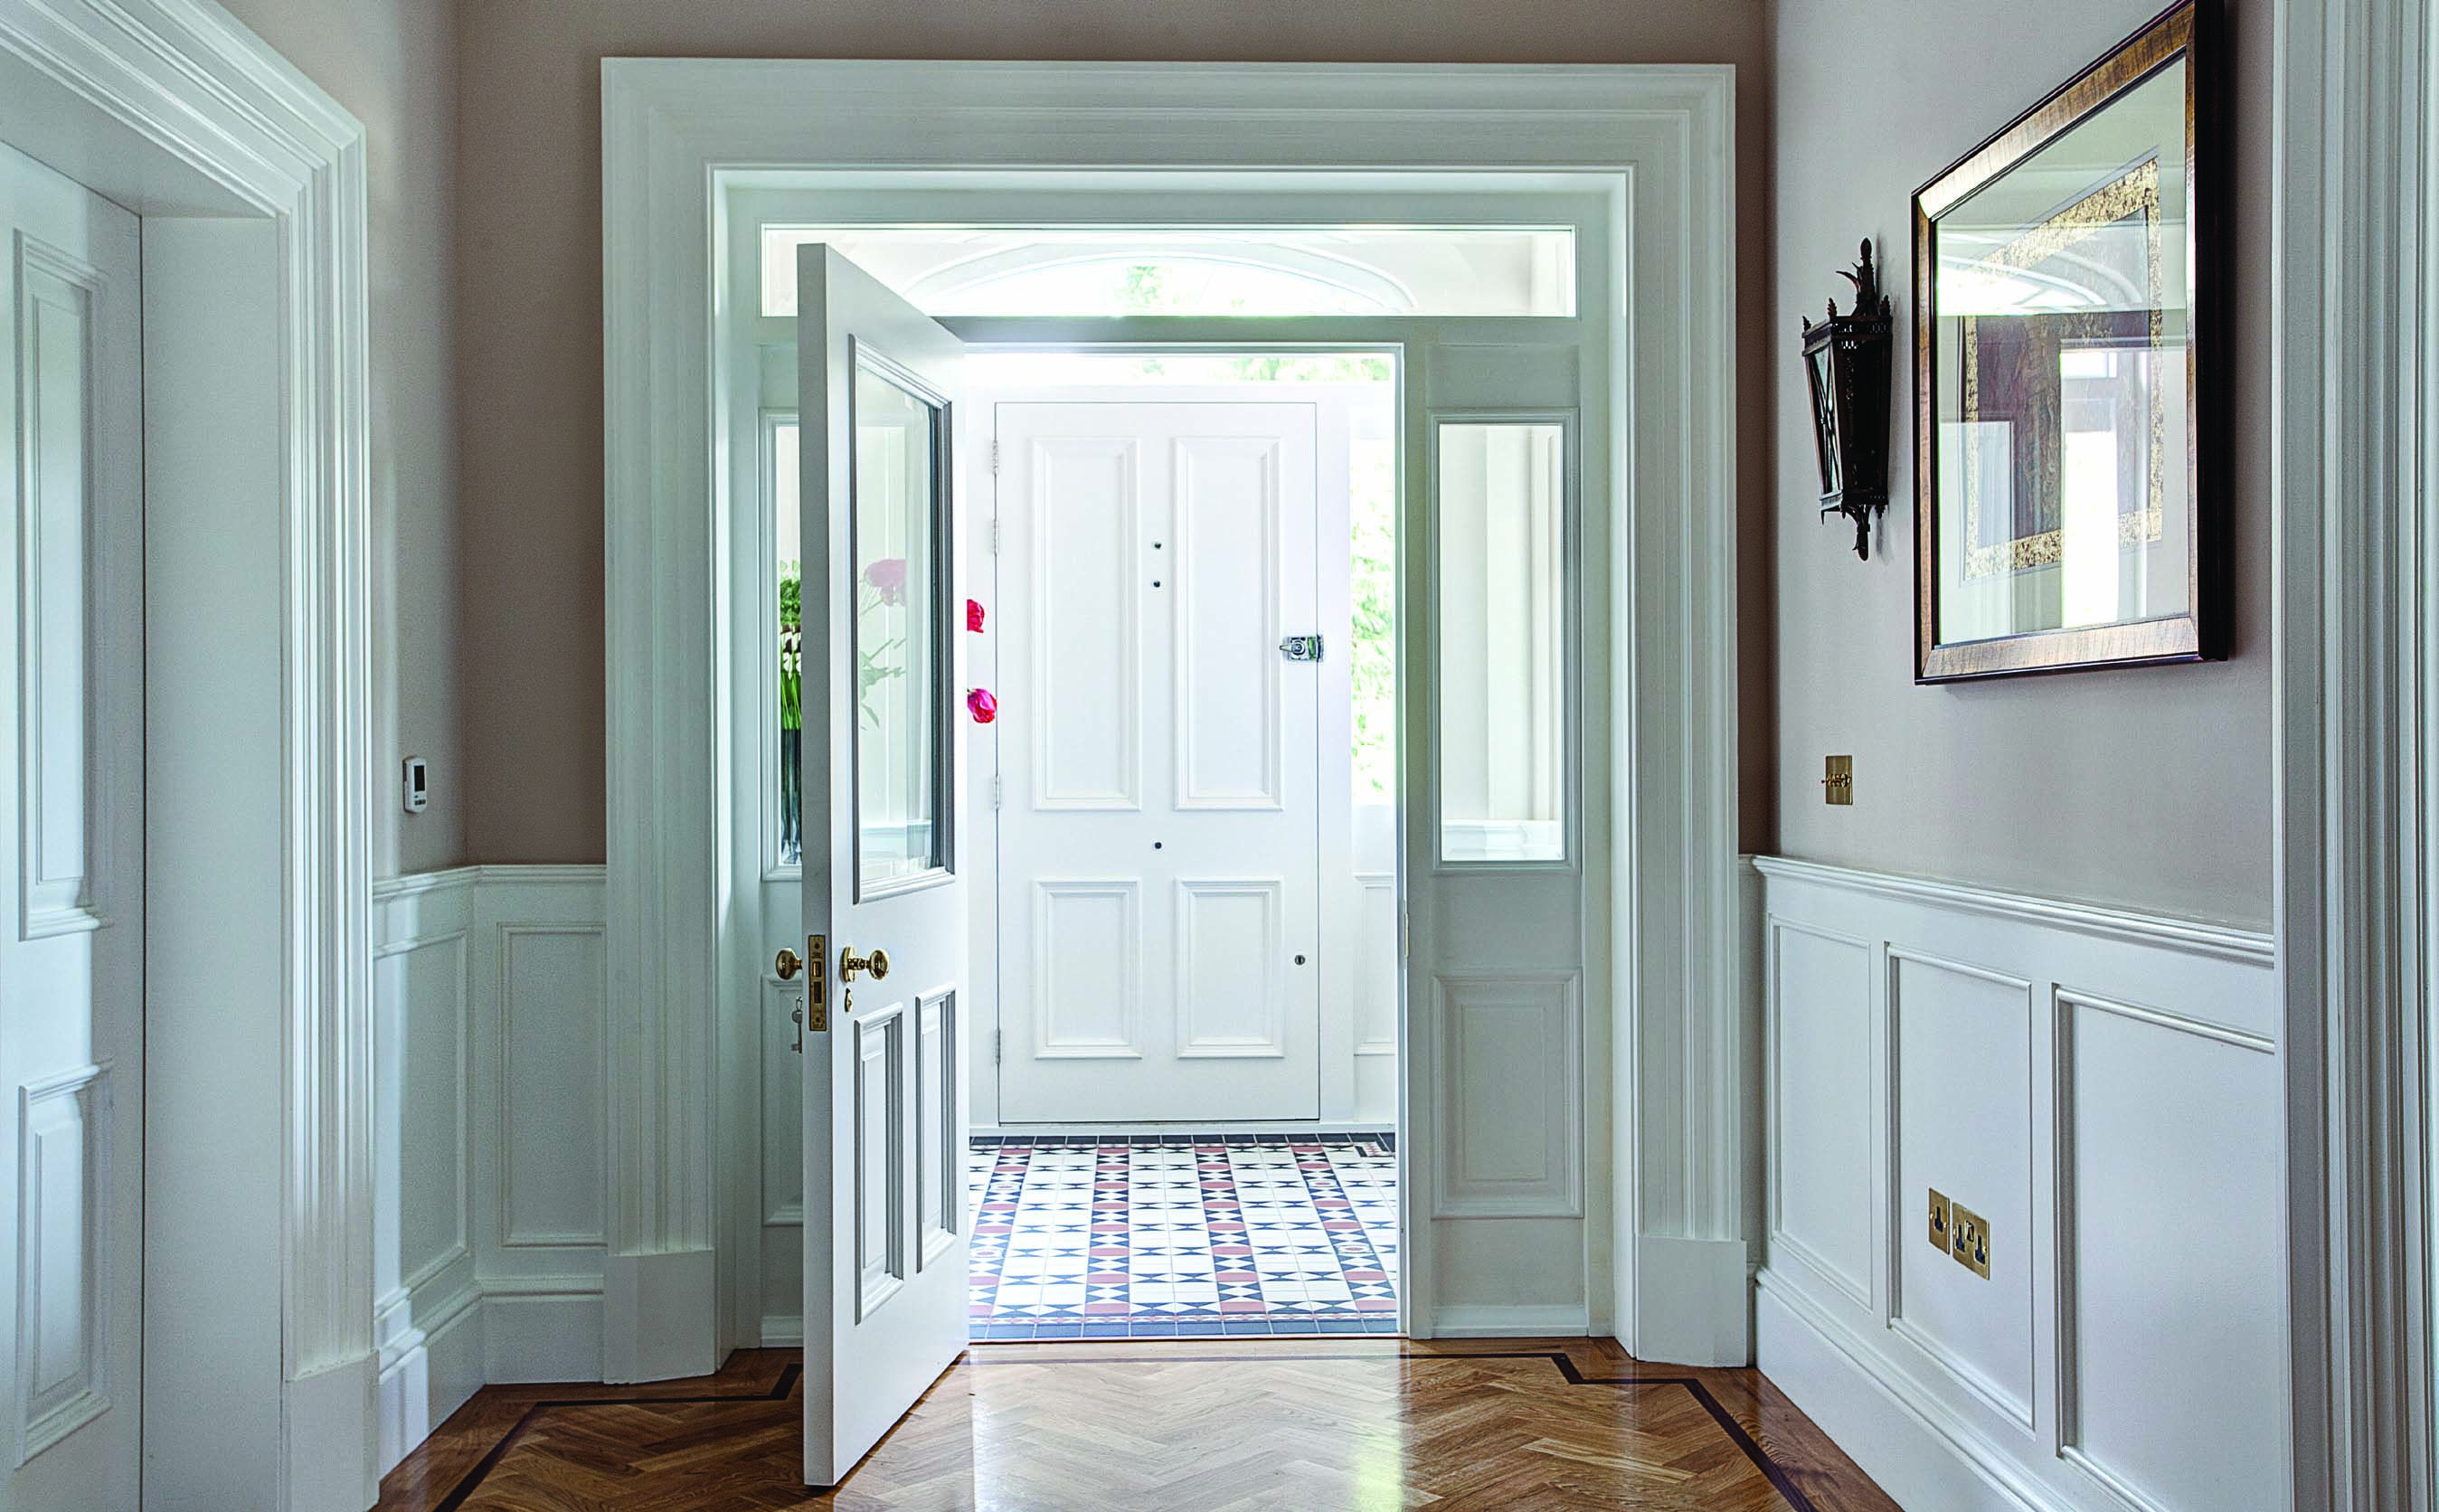 Woodmarque Bespoke Entrance Patio Doors Woodmarque Bespoke